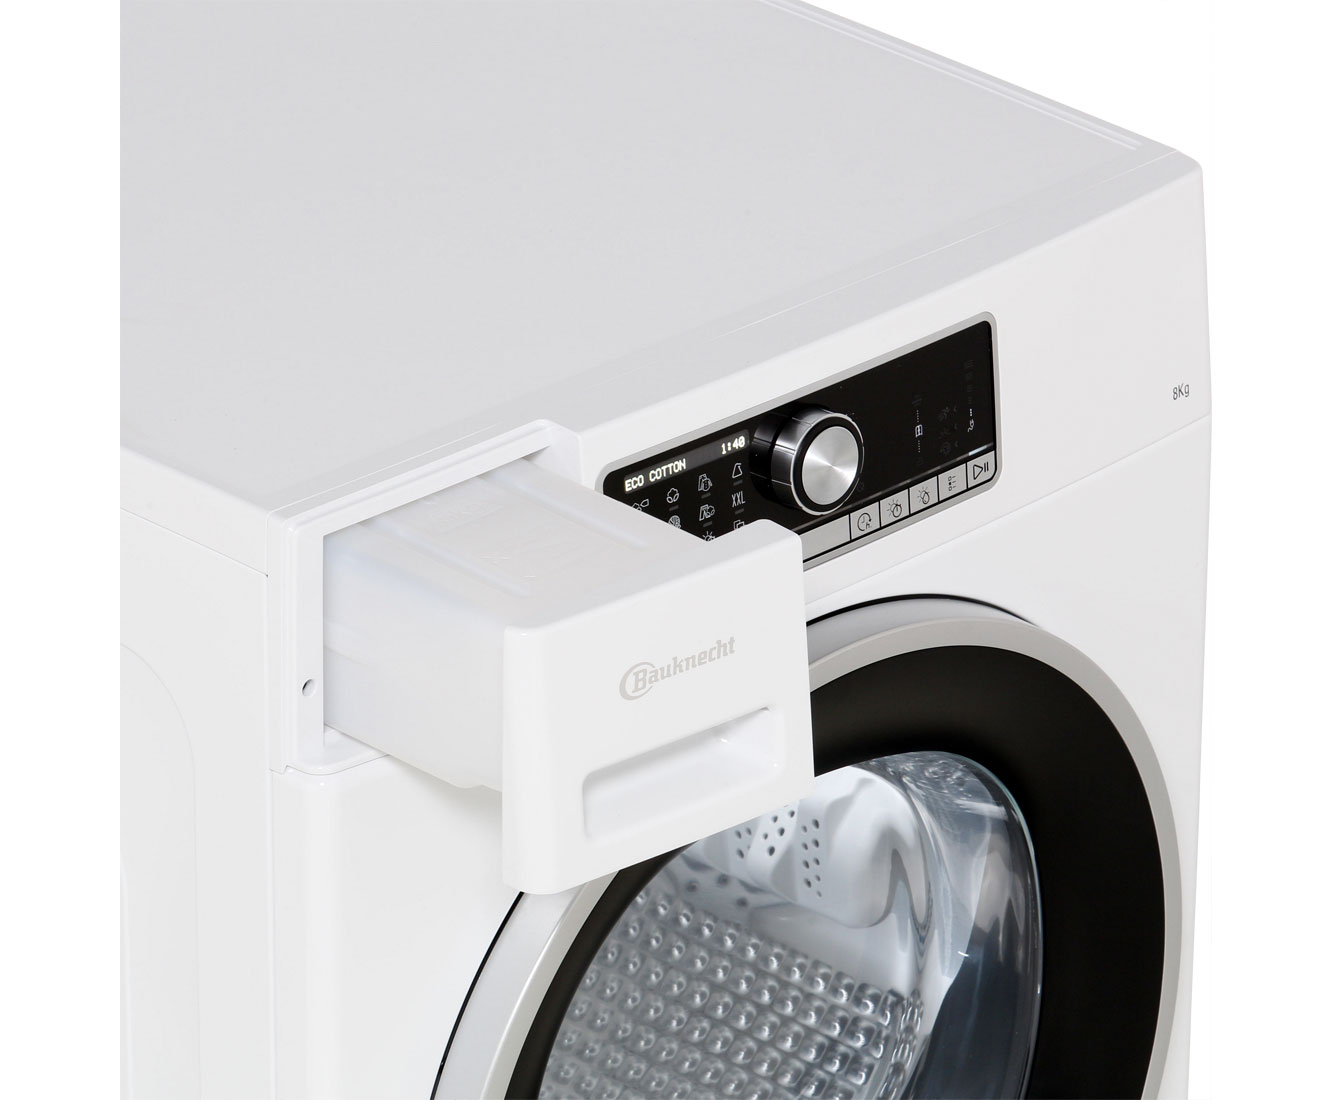 Bauknecht tk prime a bw premiumcare wärmepumpentrockner